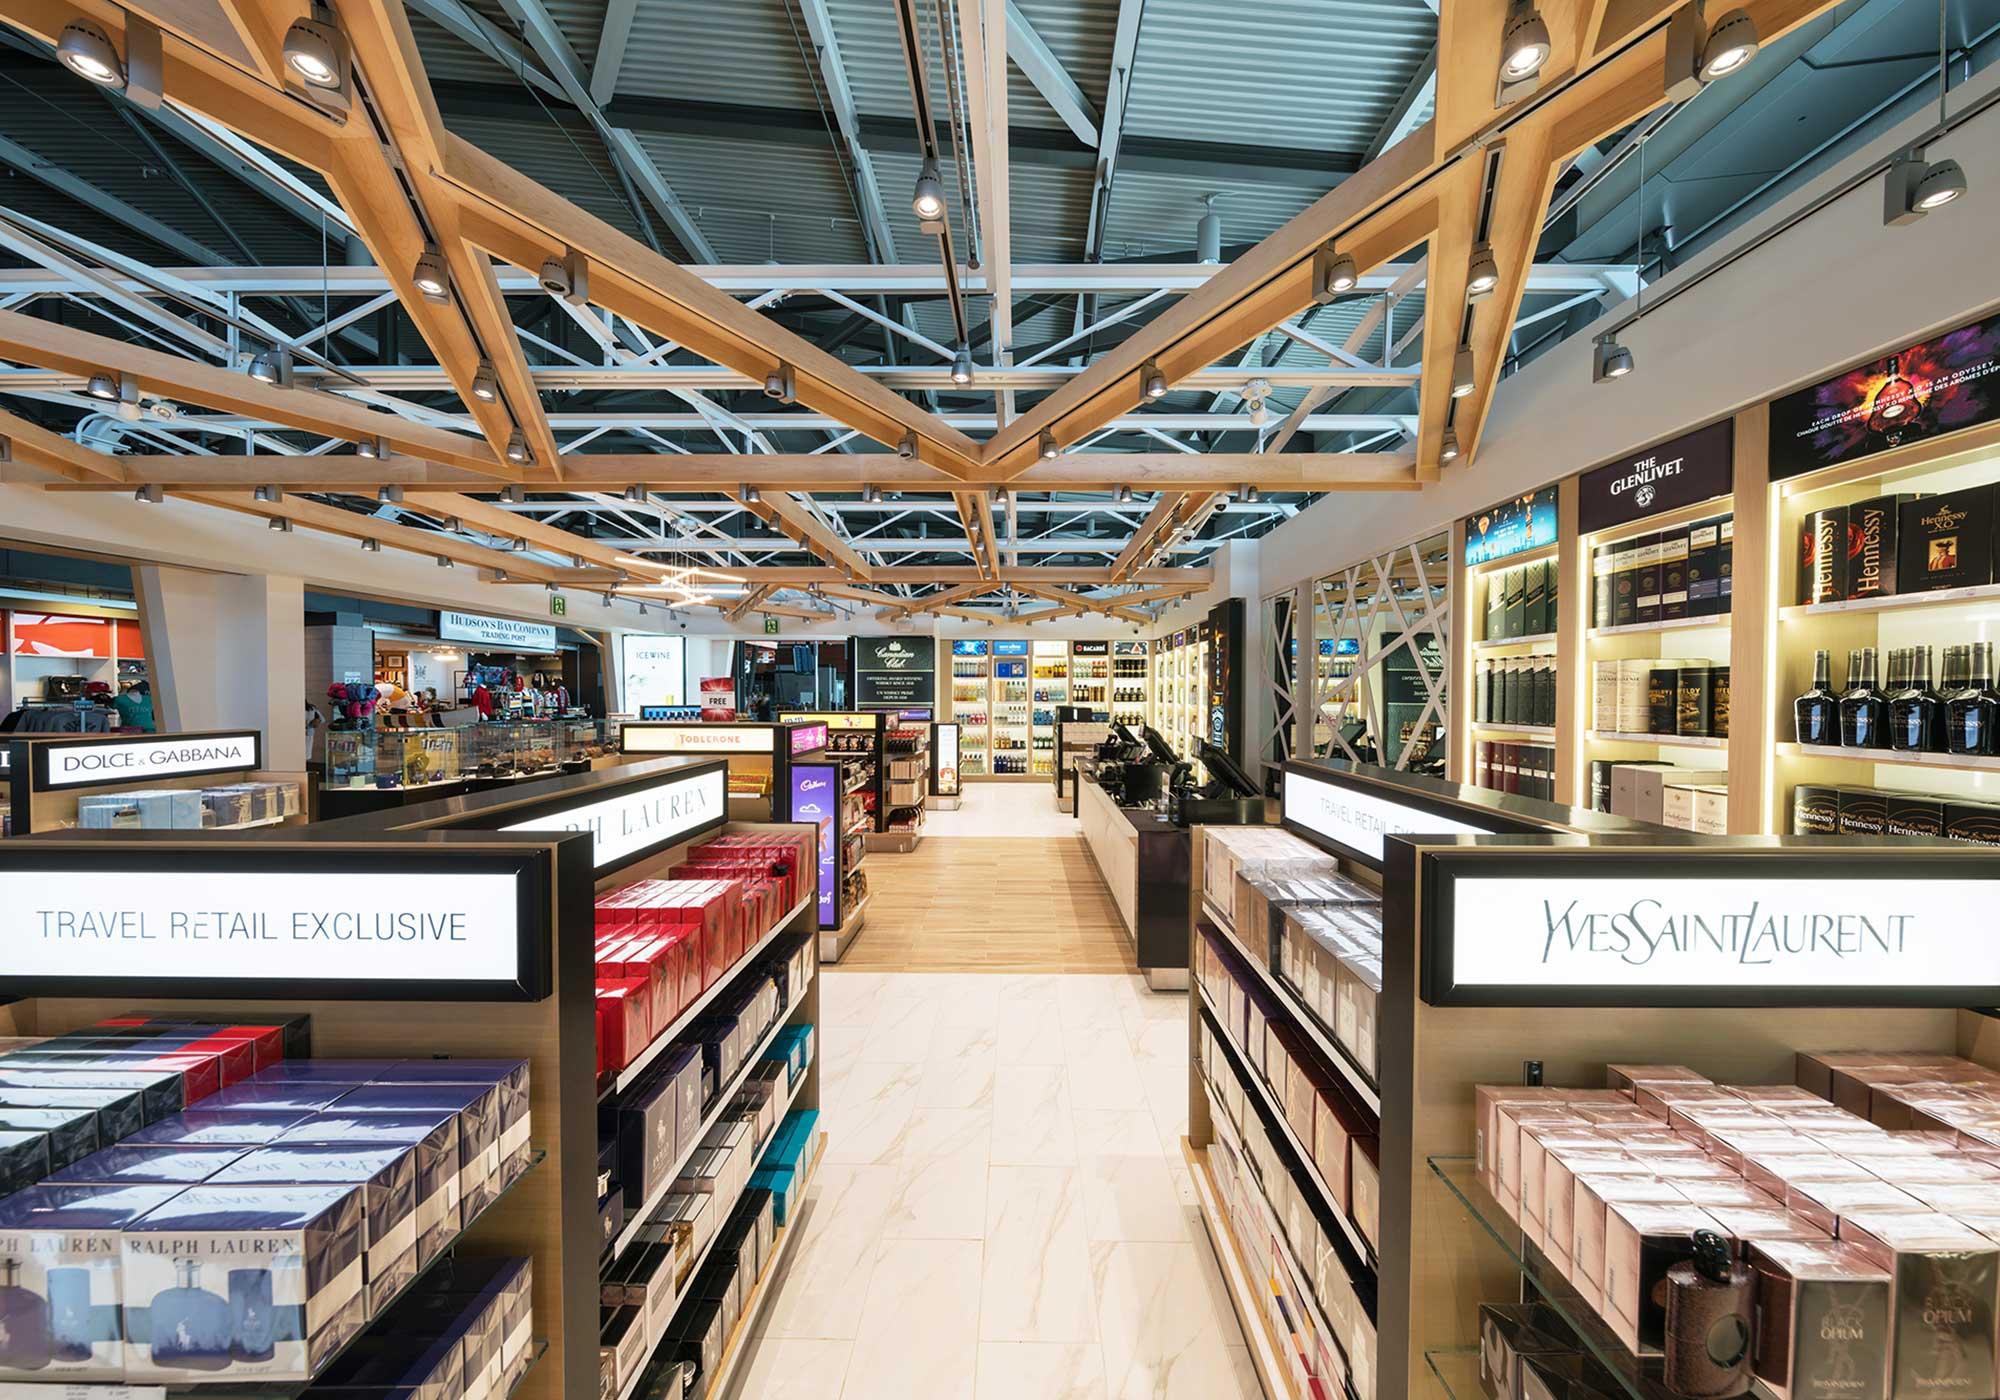 Aisles of merchandise under a lattice work ceiling